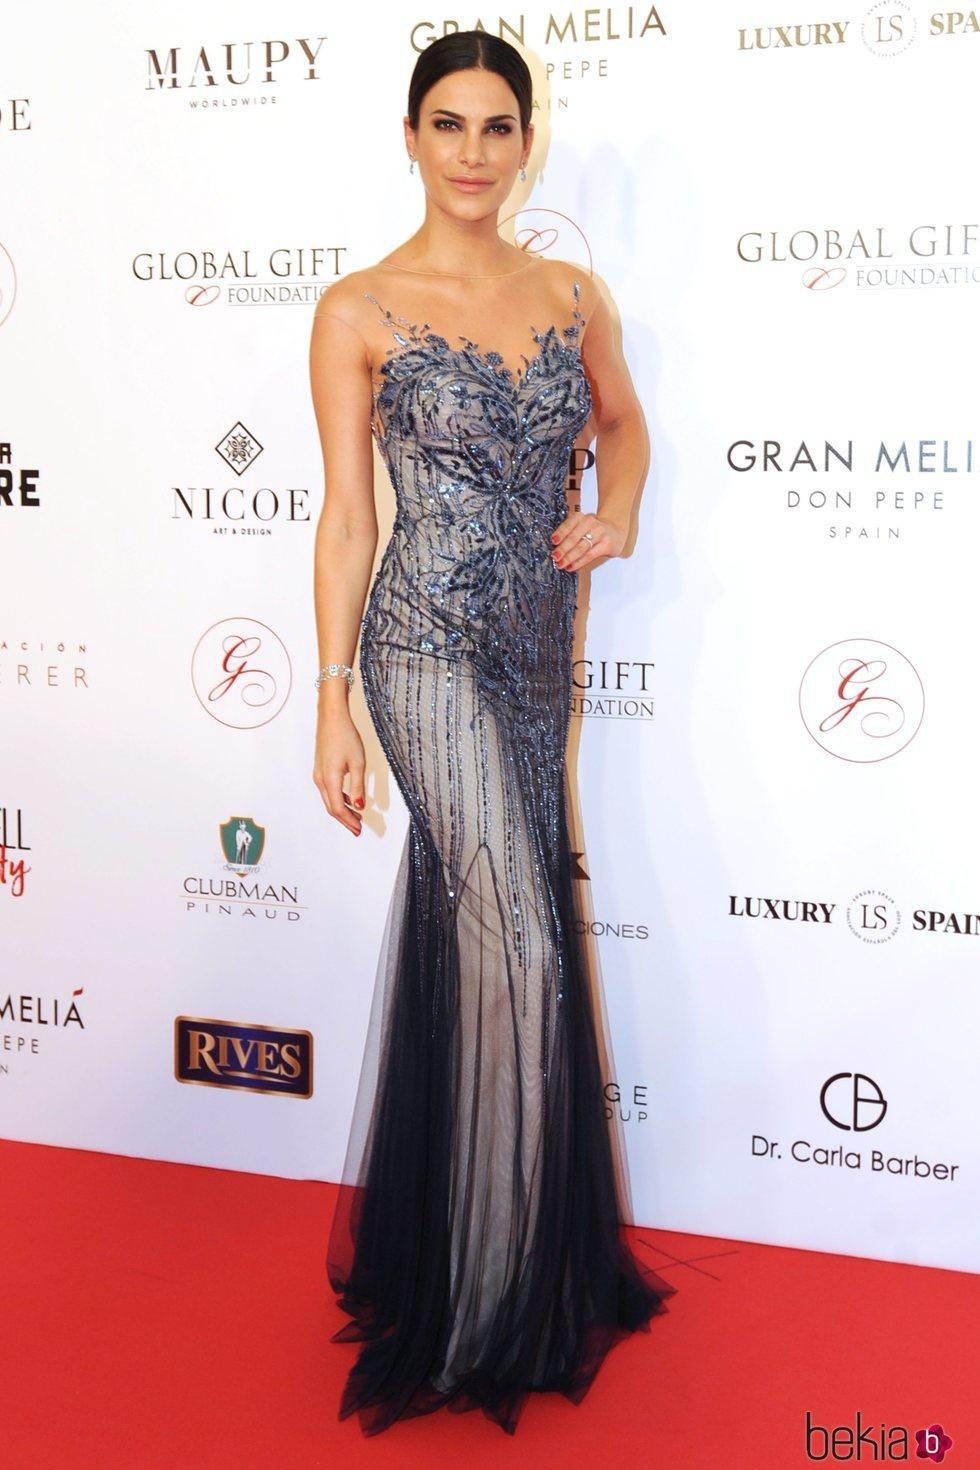 La modelo Carla Barber posando durante la gala Global Gift Marbella 2018